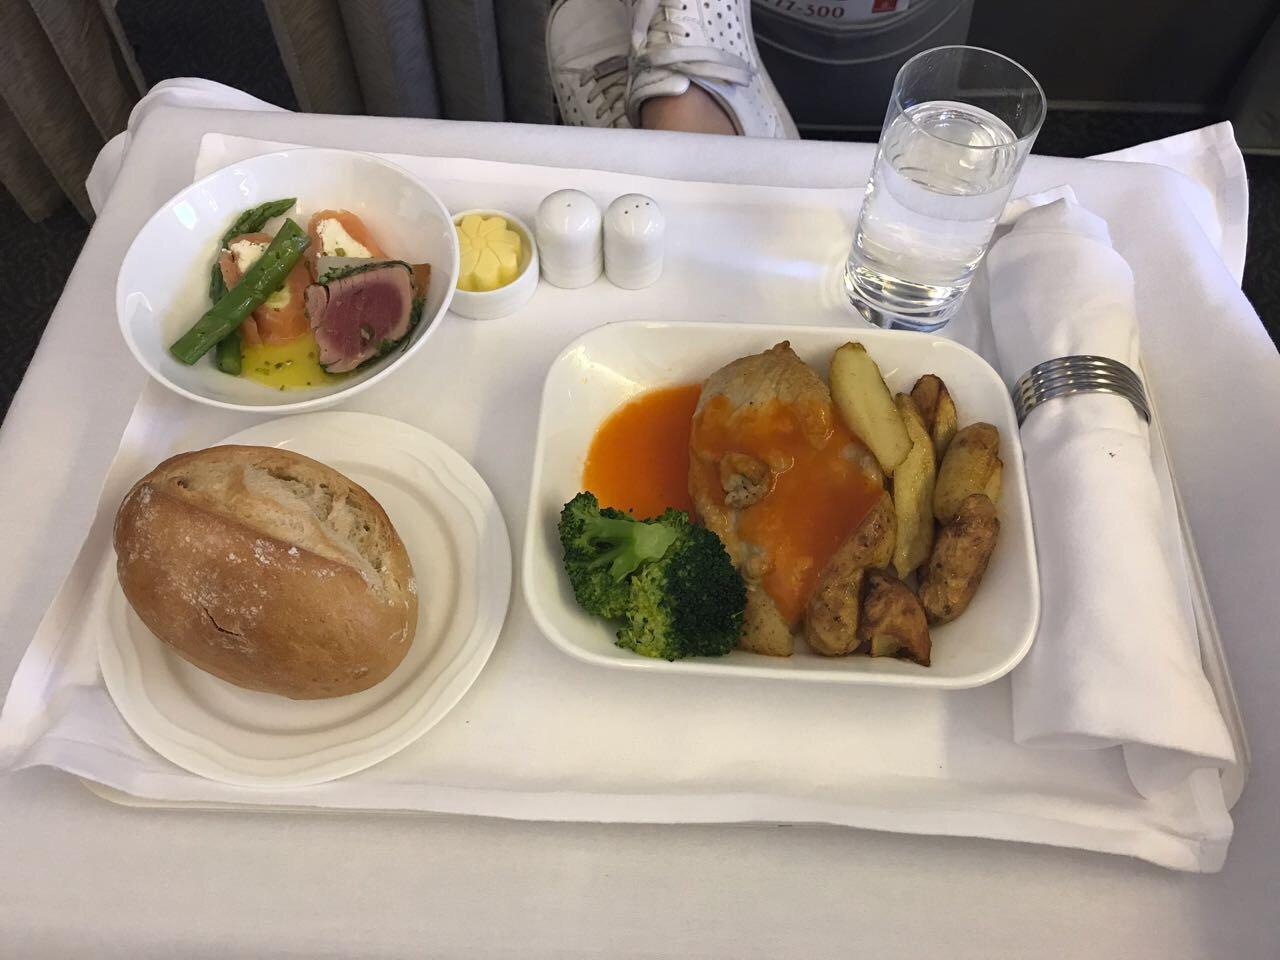 Завтрак в бизнес-классе авиакомпании Emirates